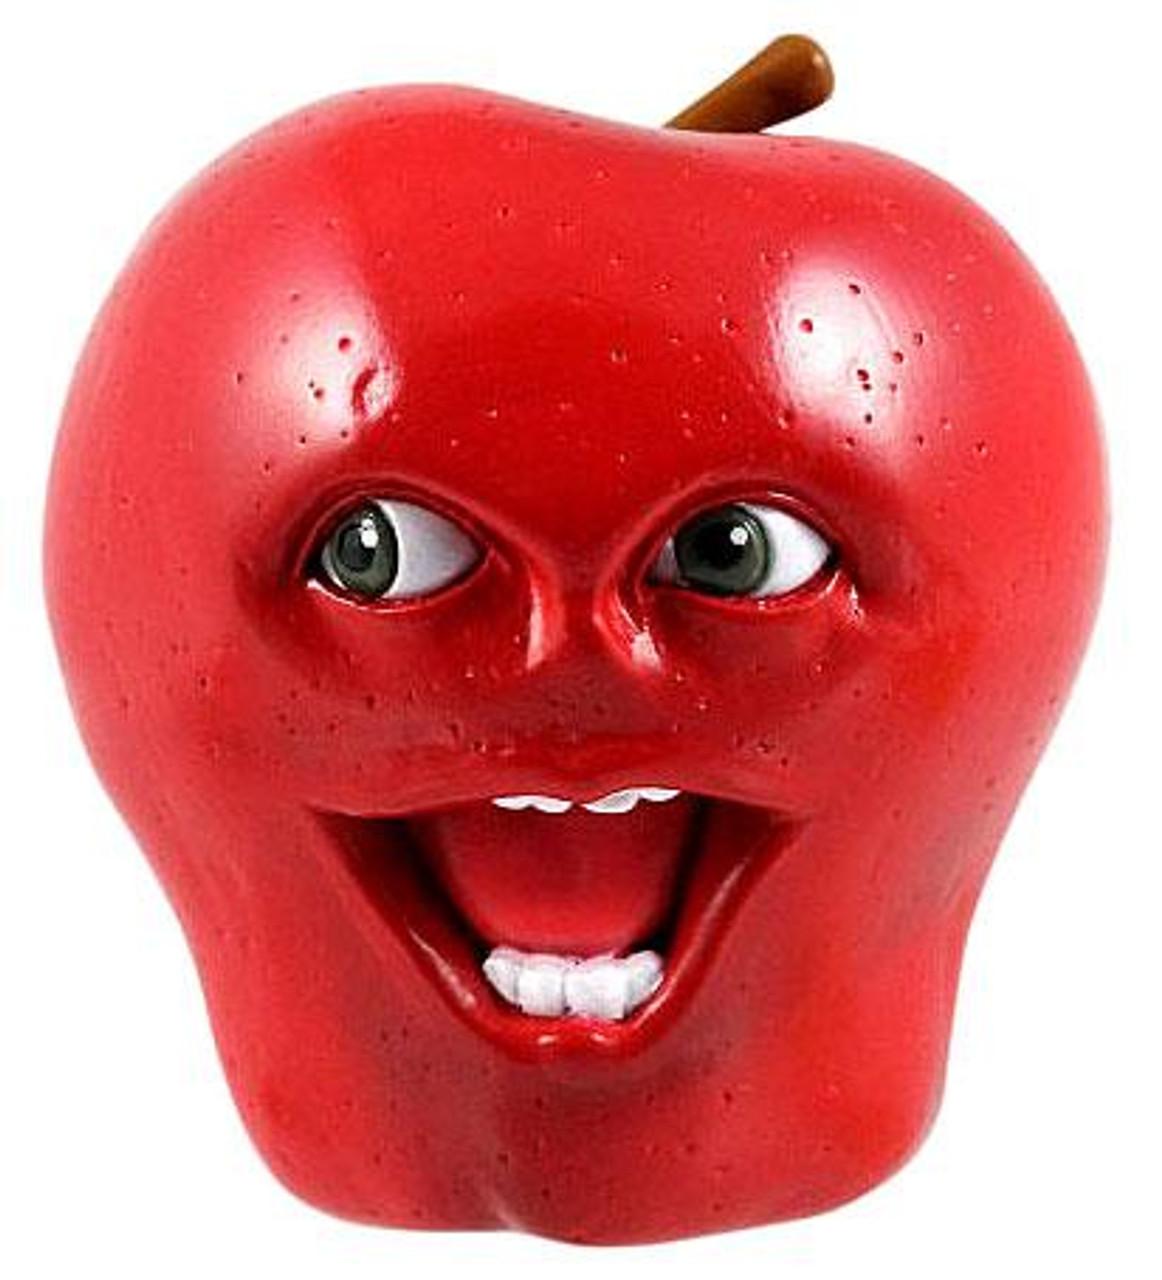 Annoying Orange Midget Apple 2.5-Inch PVC Figure [Talking]